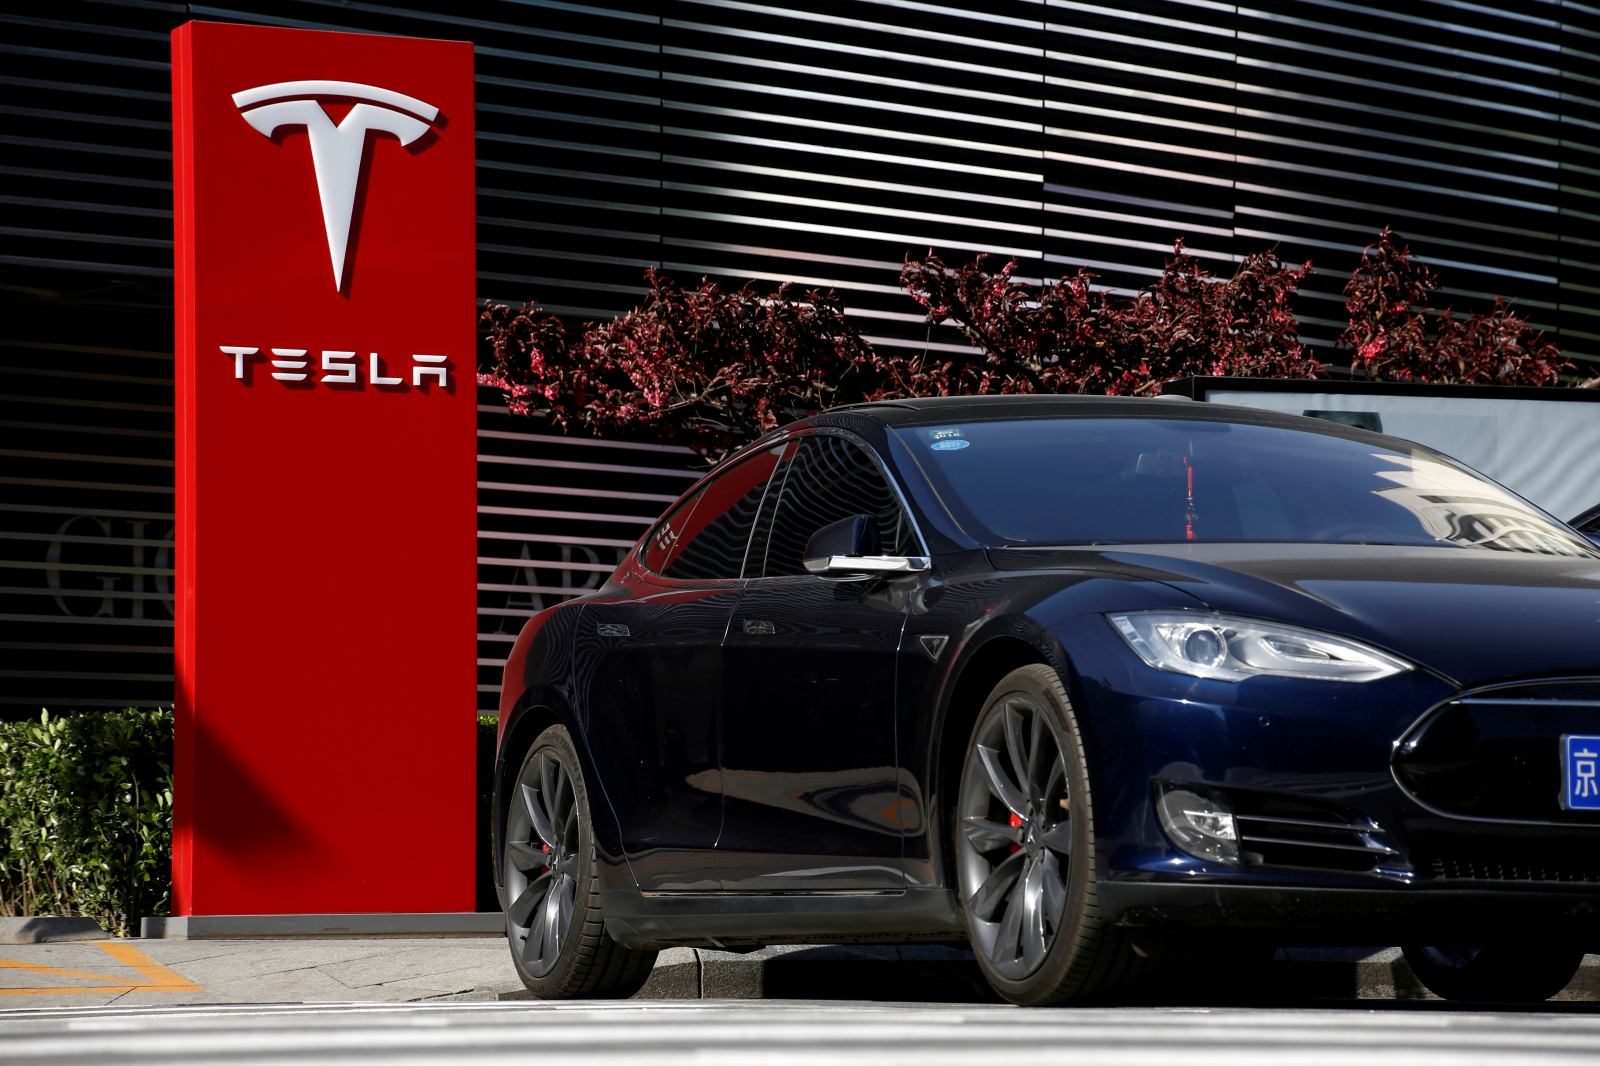 Tesla stock price: Is Elon Musk's $420-a-share proposal fair?